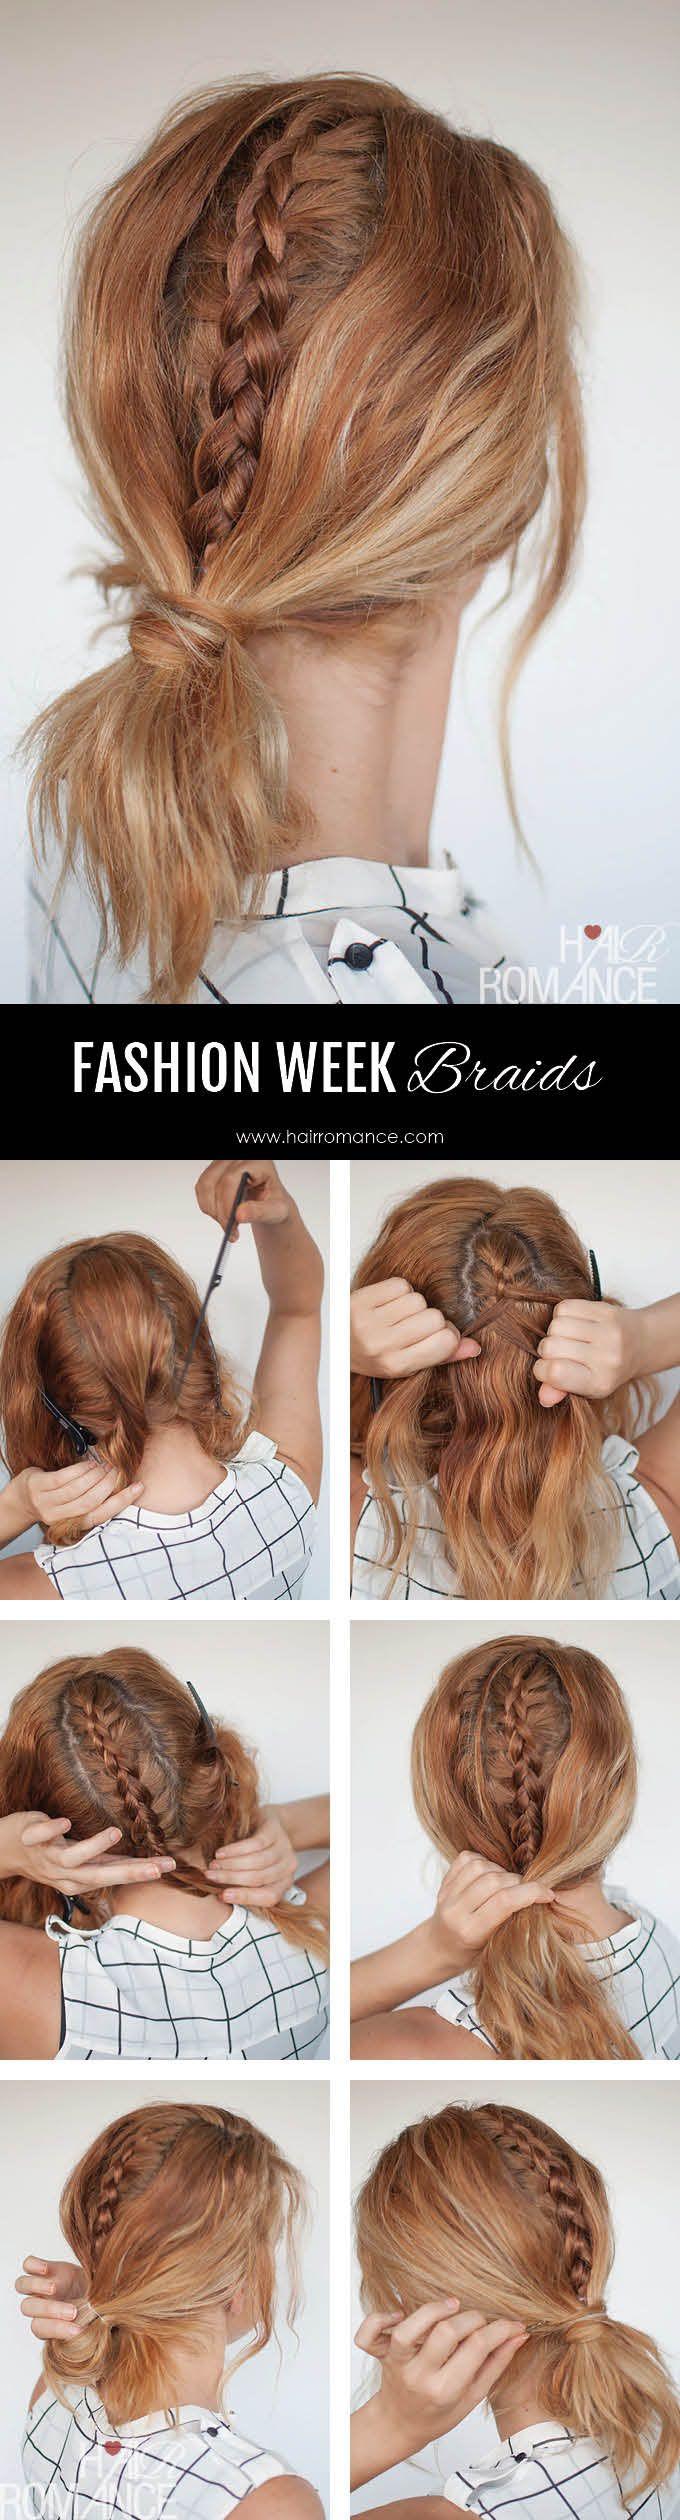 Fashion week braids